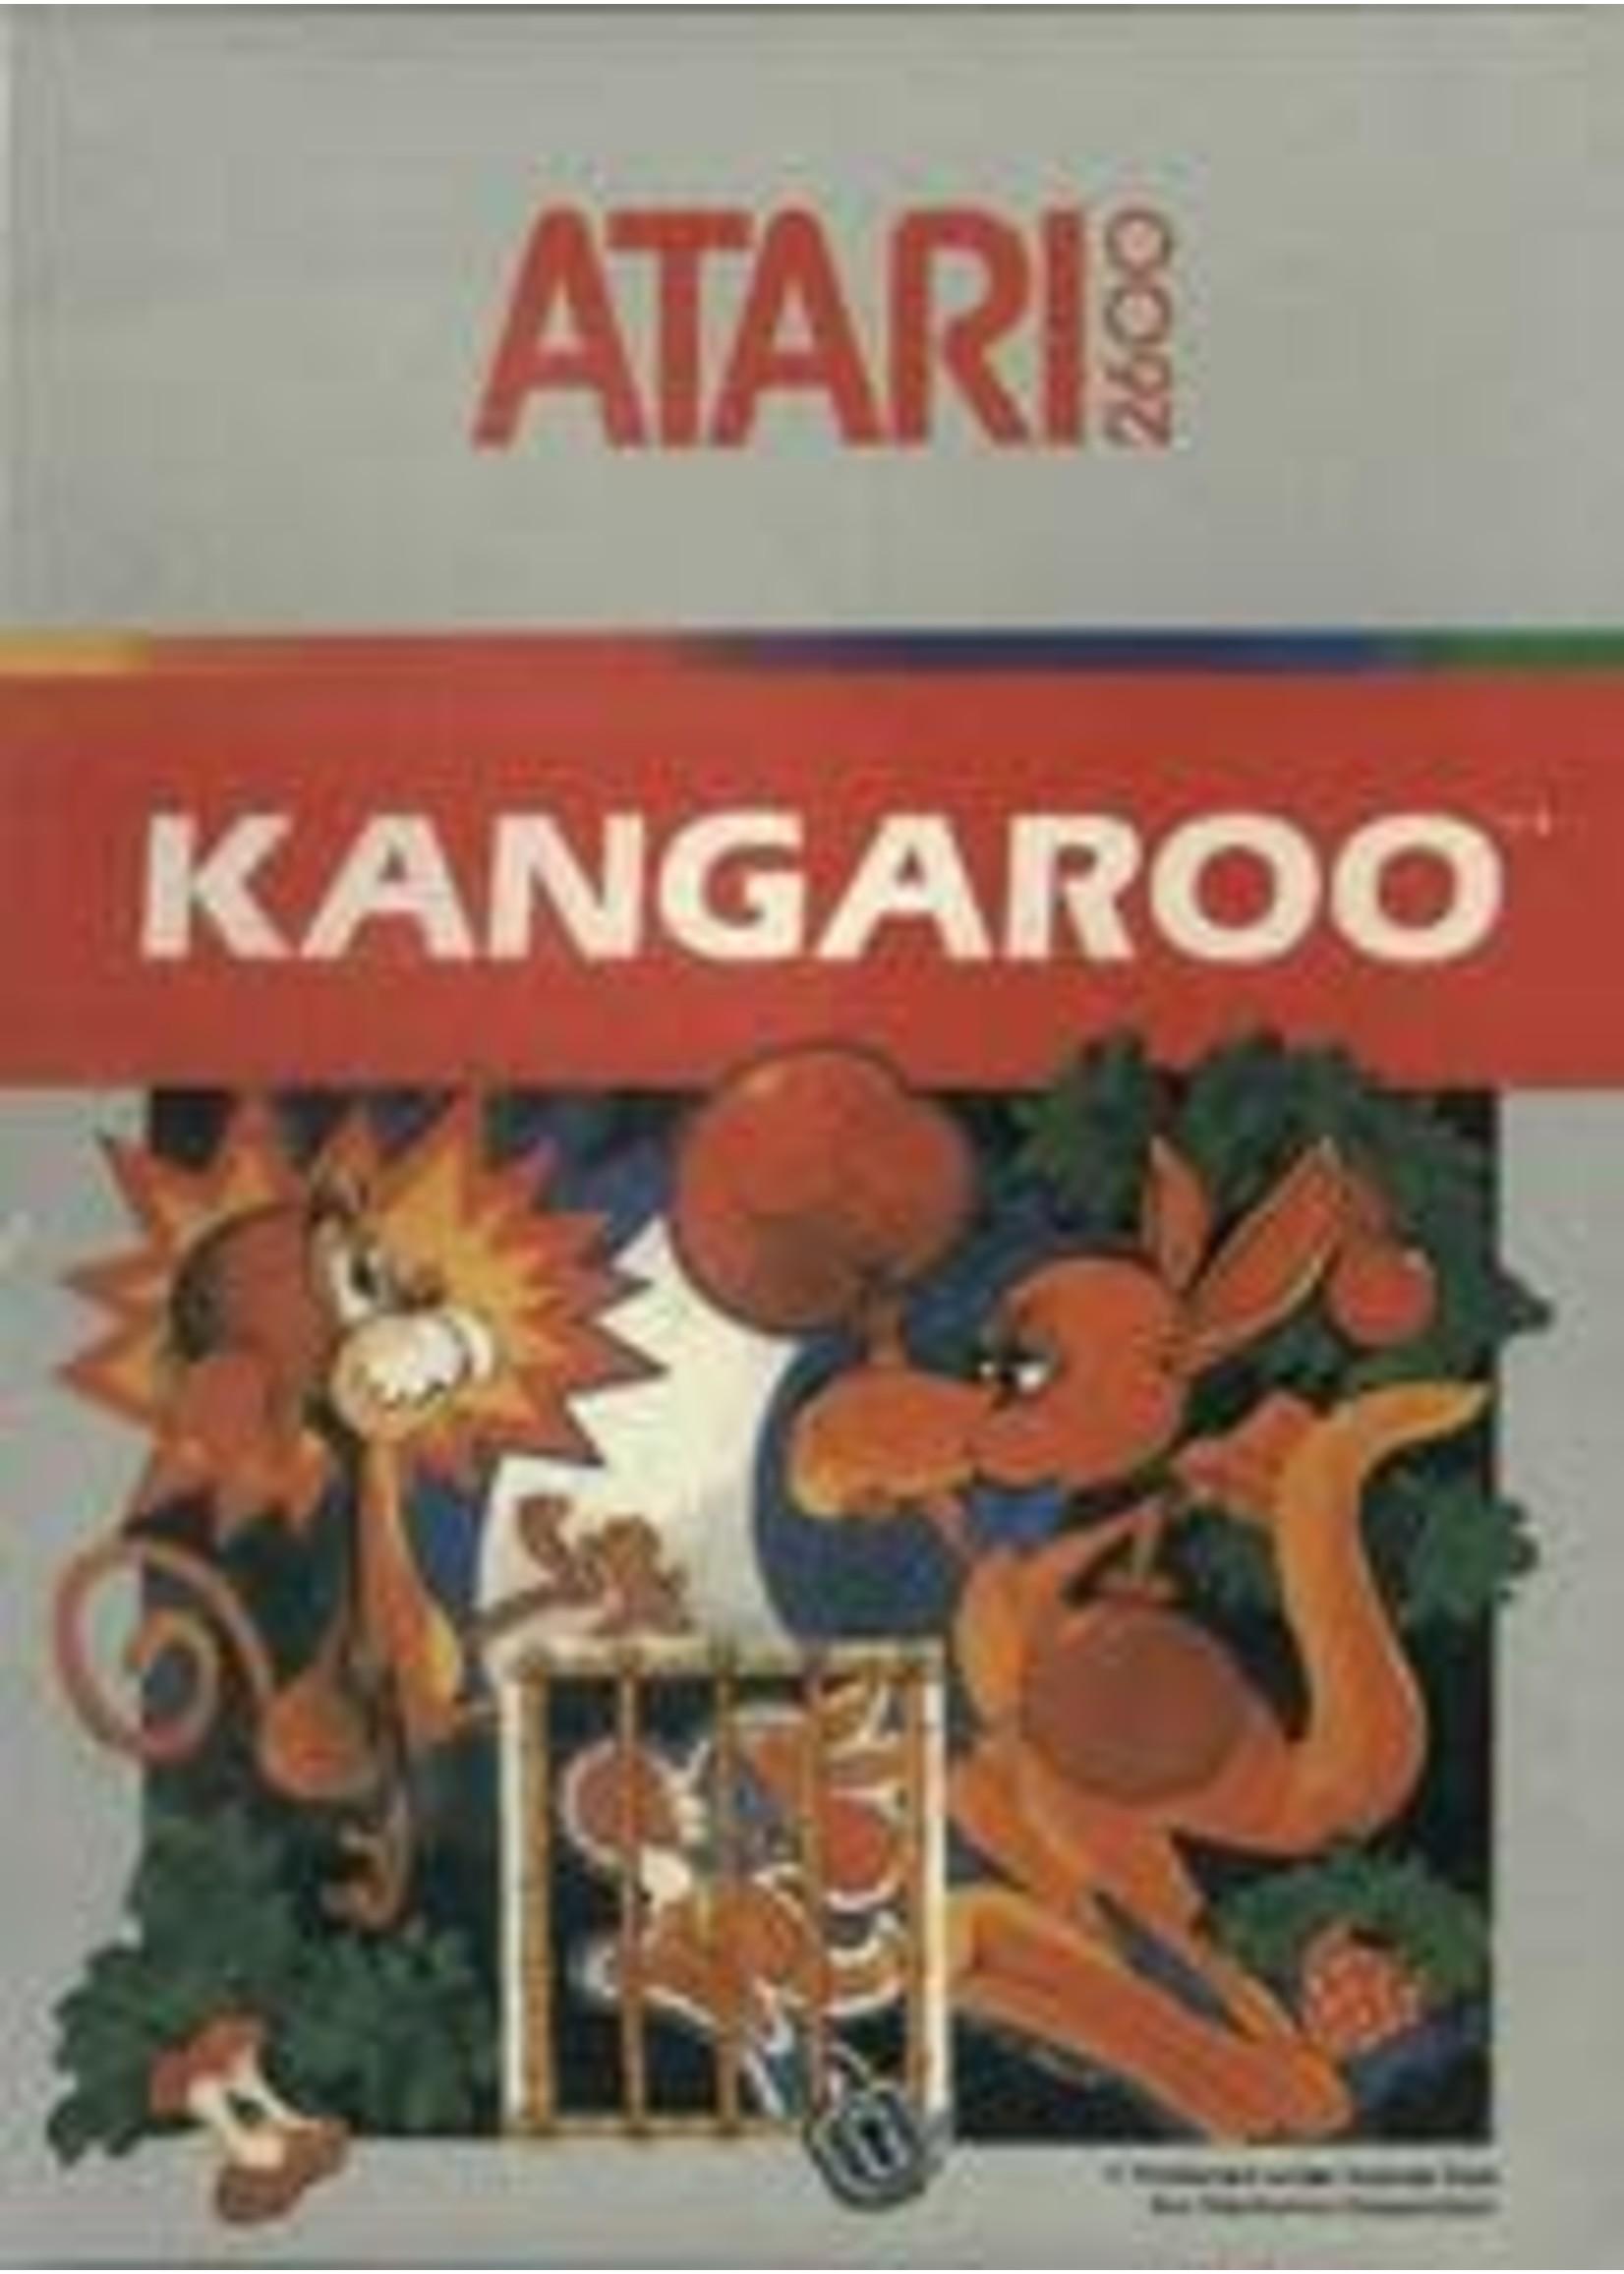 Kangaroo Atari 2600